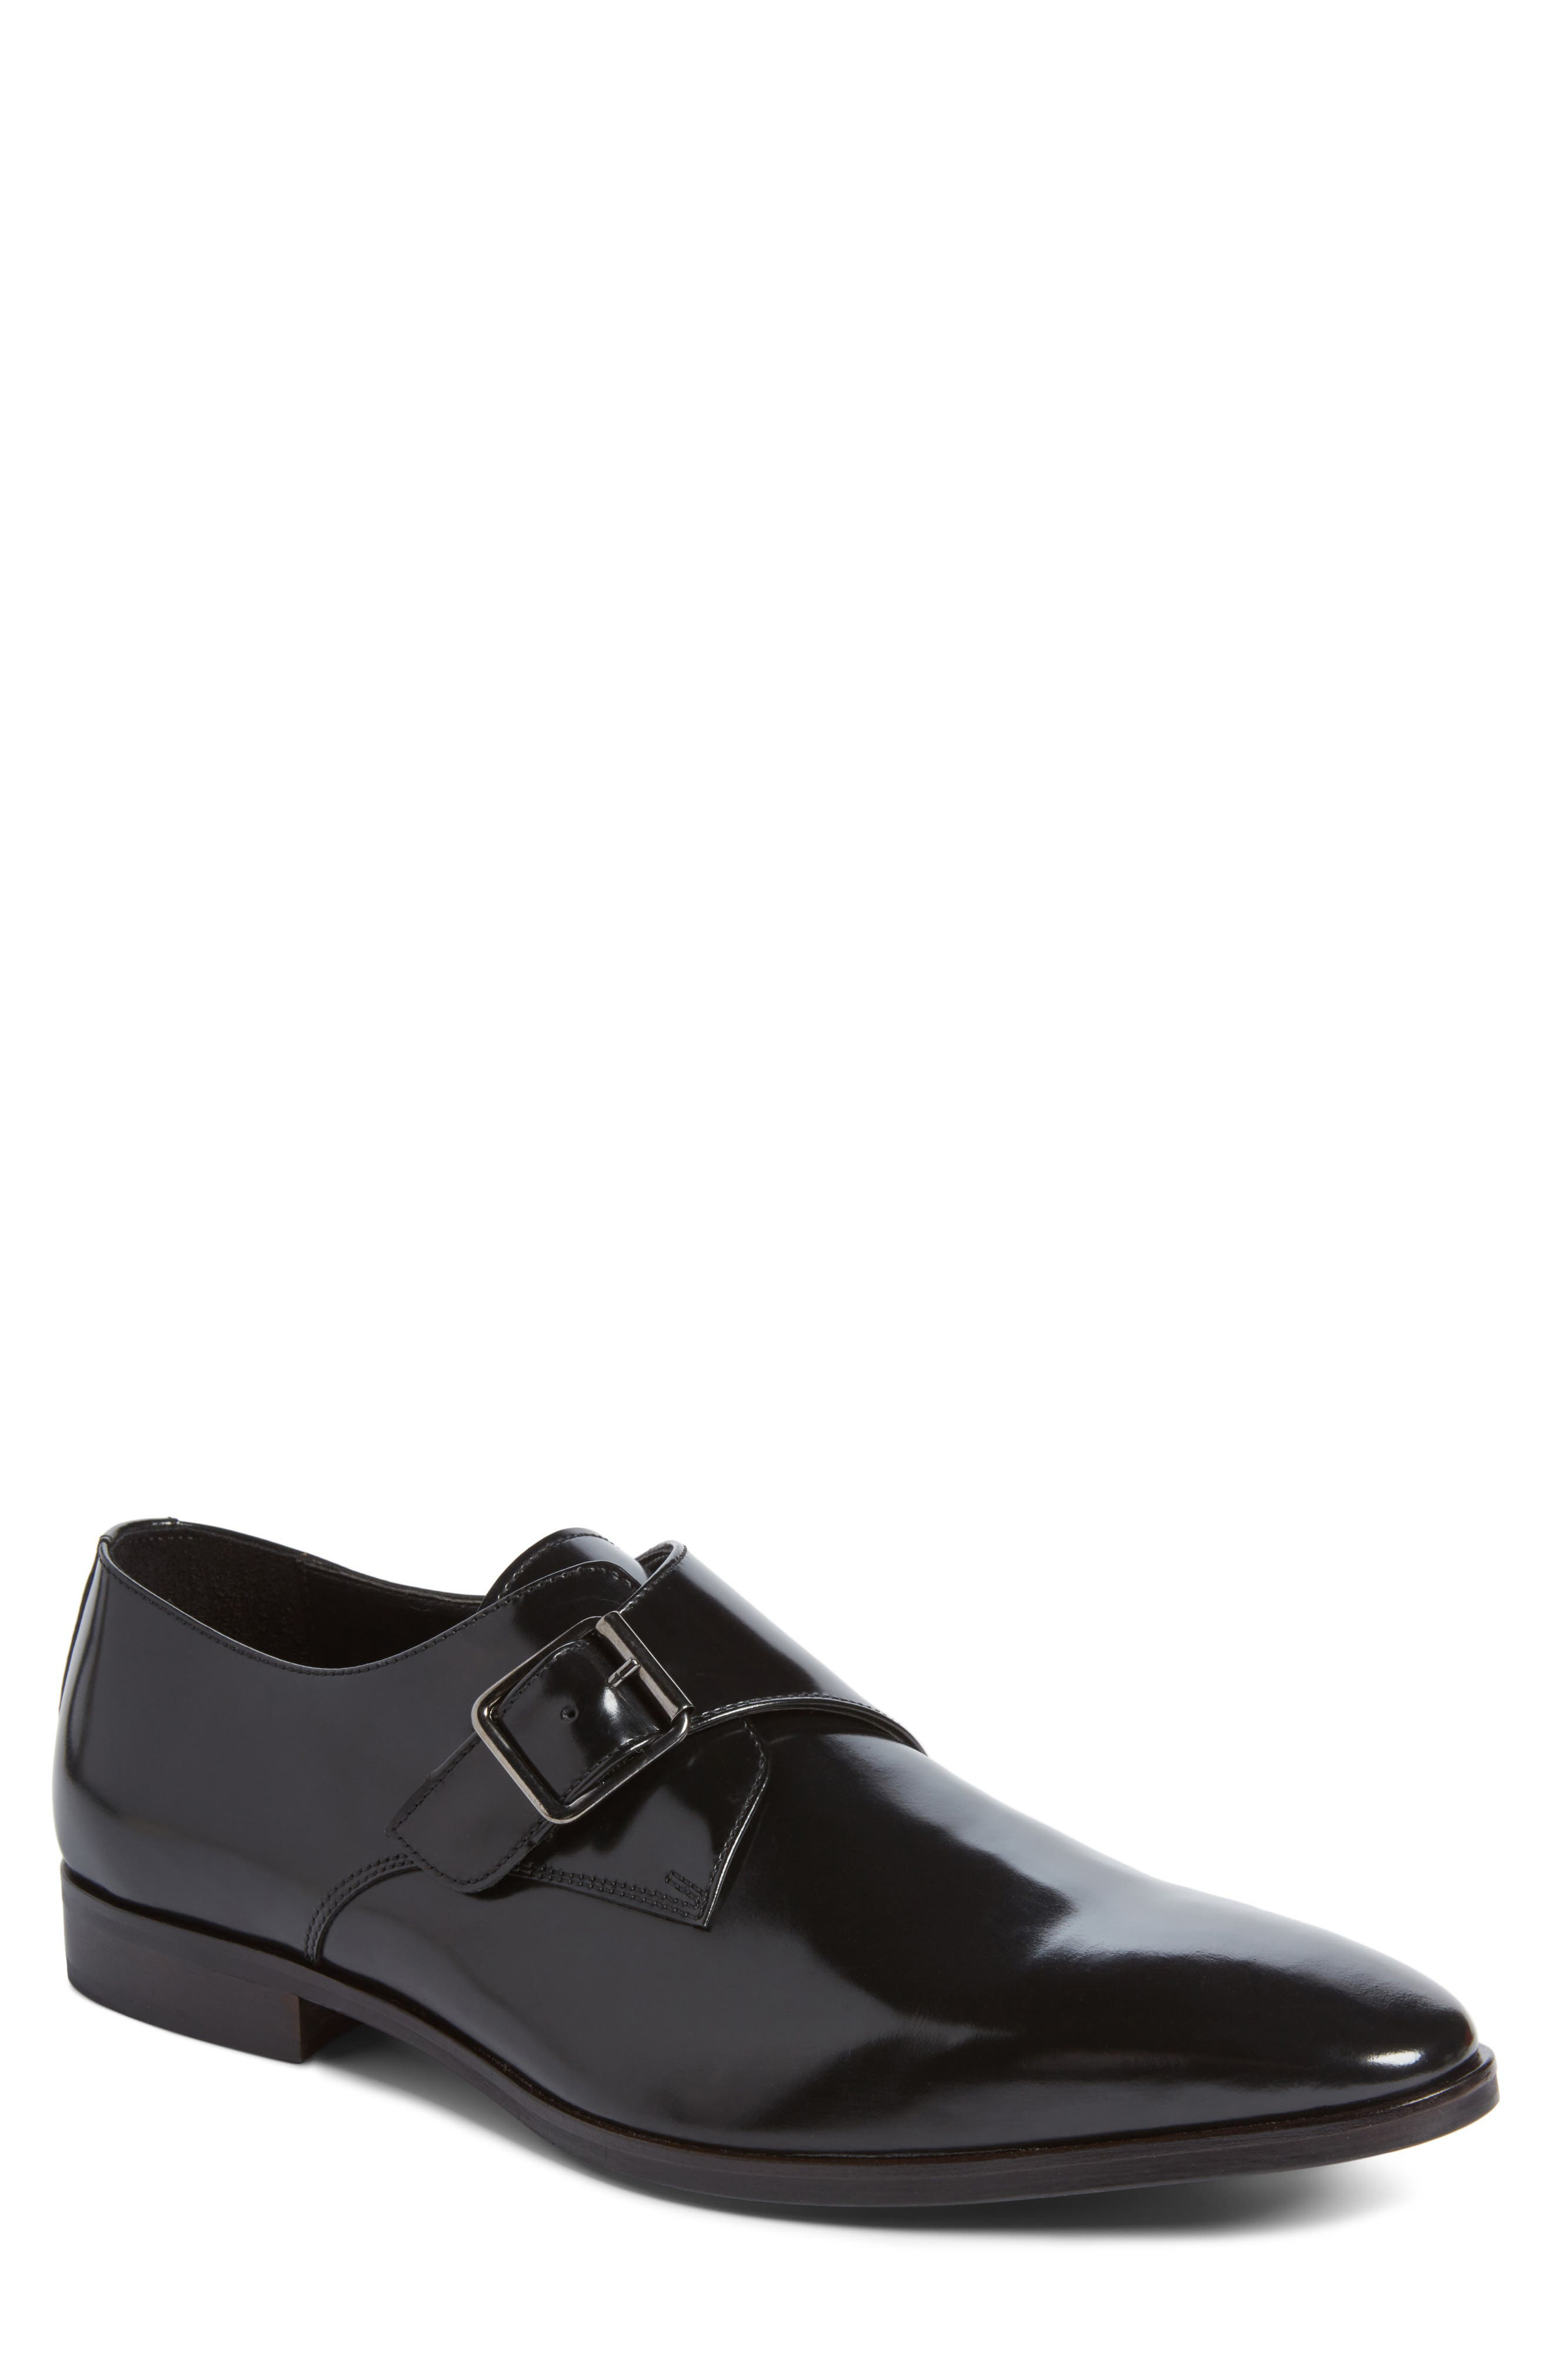 Webster Single Strap Monk Shoe,                         Main,                         color, 001